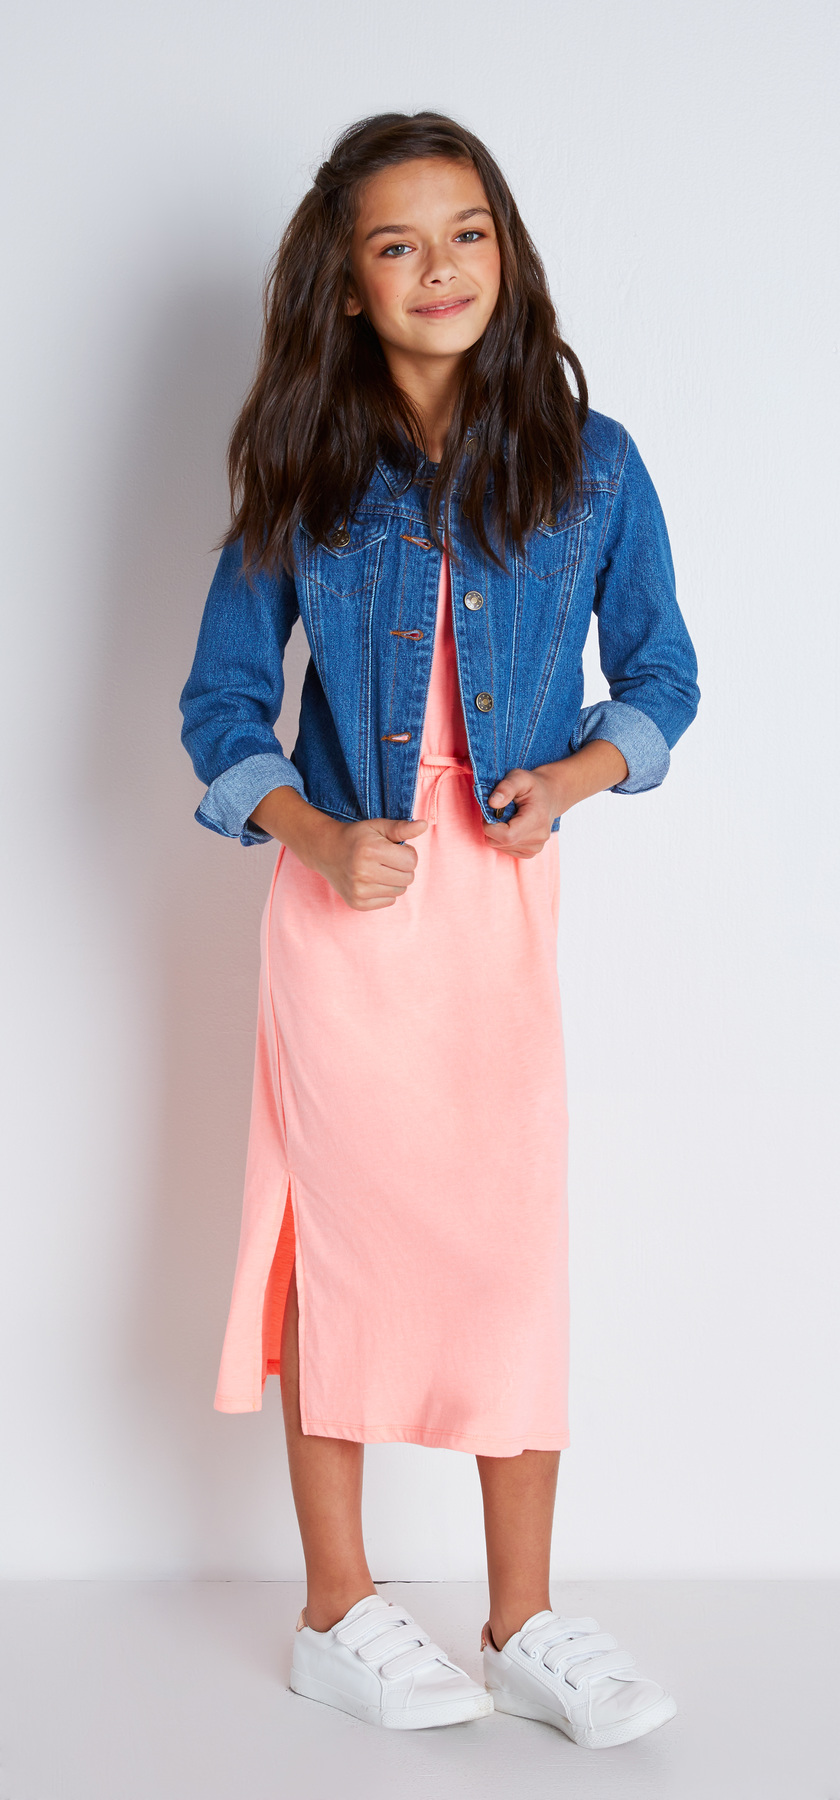 49cb1849765 Denim Jacket Midi Dress Outfit - FabKids